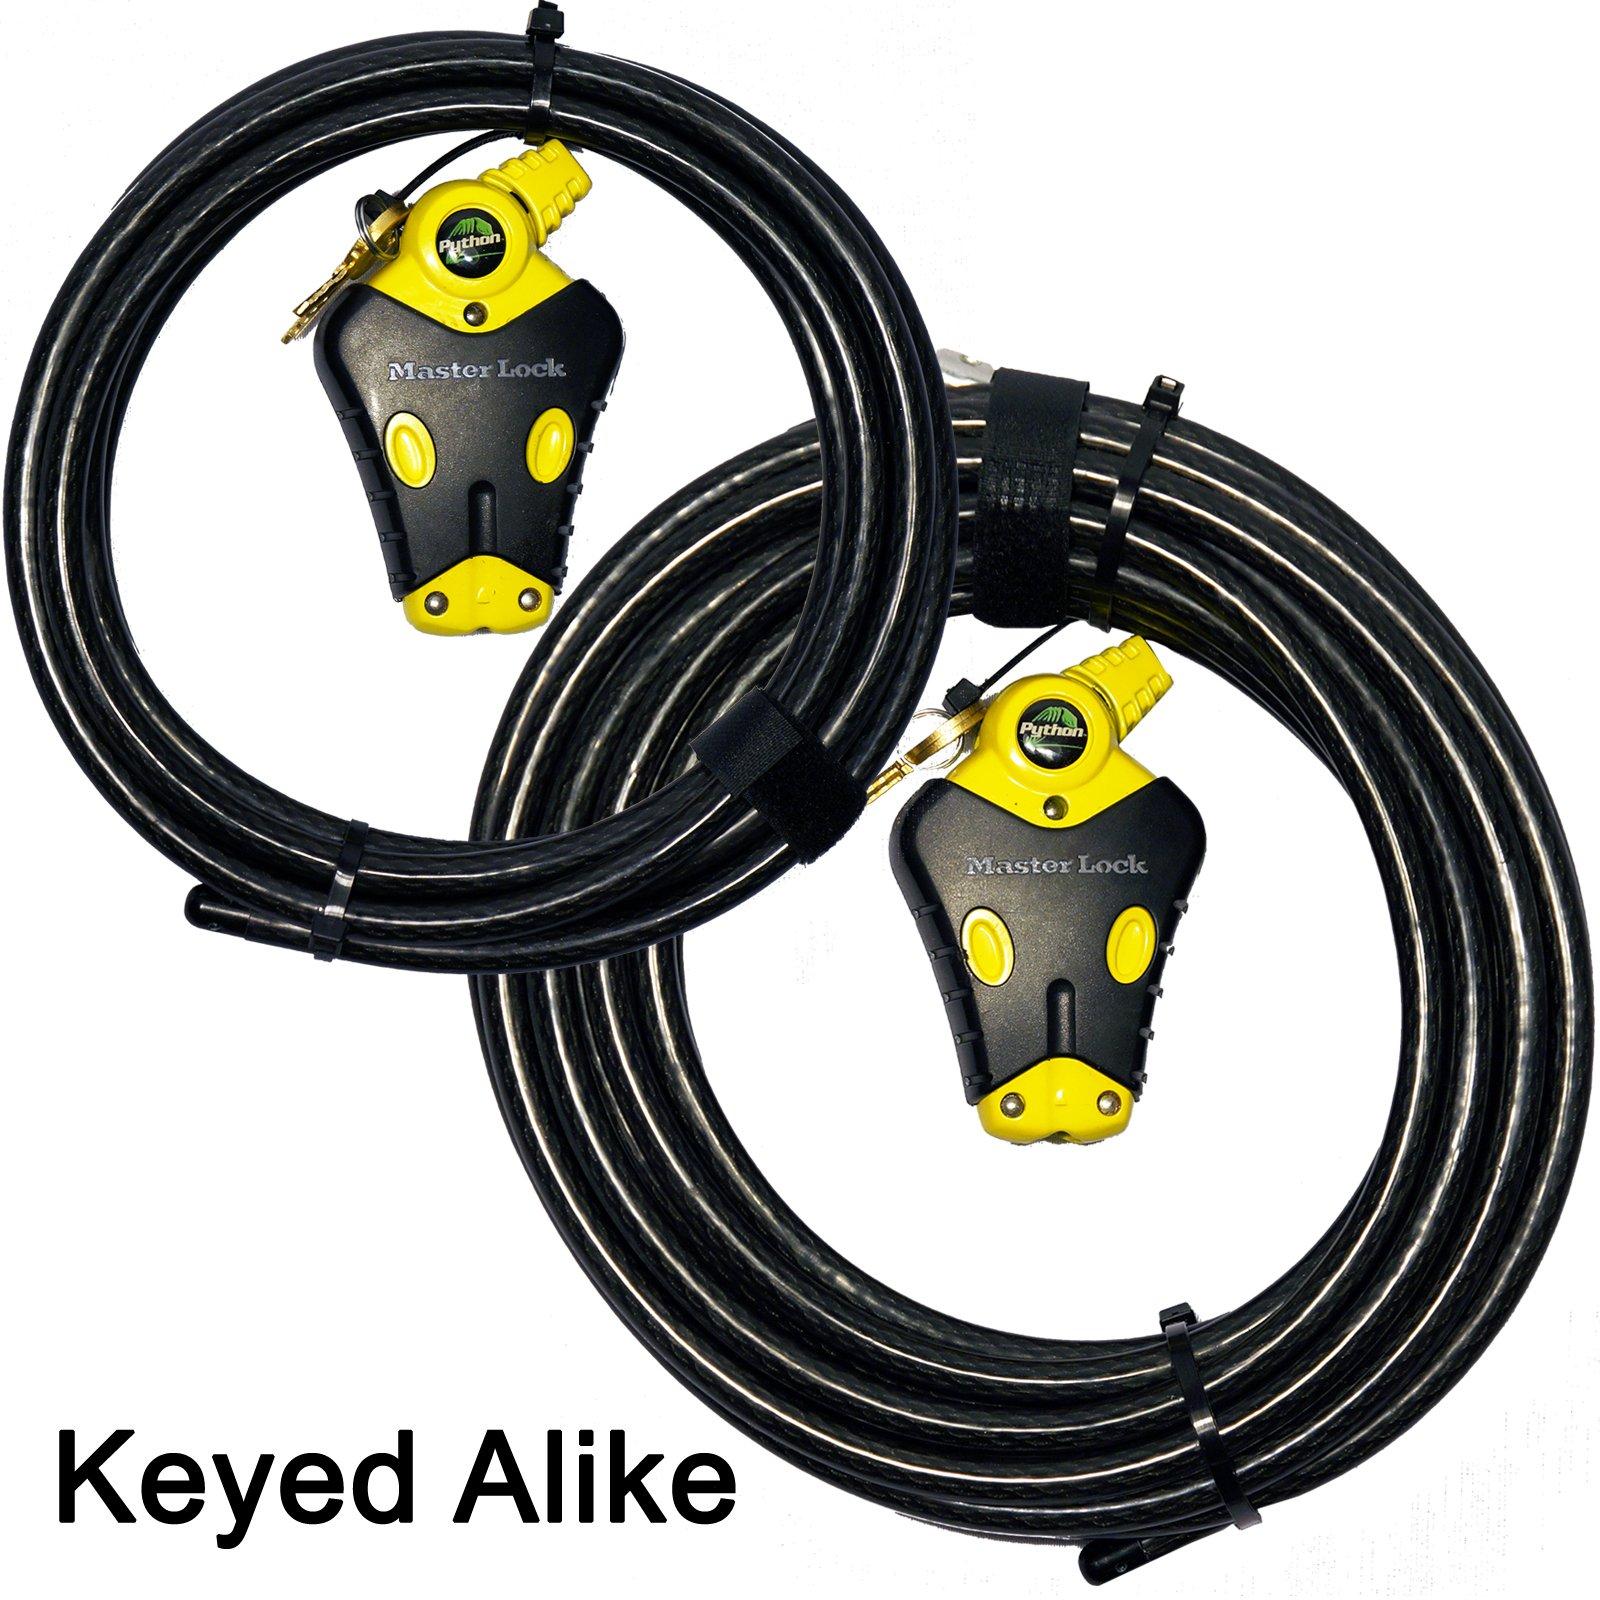 Master Lock - Two Python Adjustable Cable Locks Keyed Alike, 1-12ft, 1-30ft, - #8413KACBL-12-30